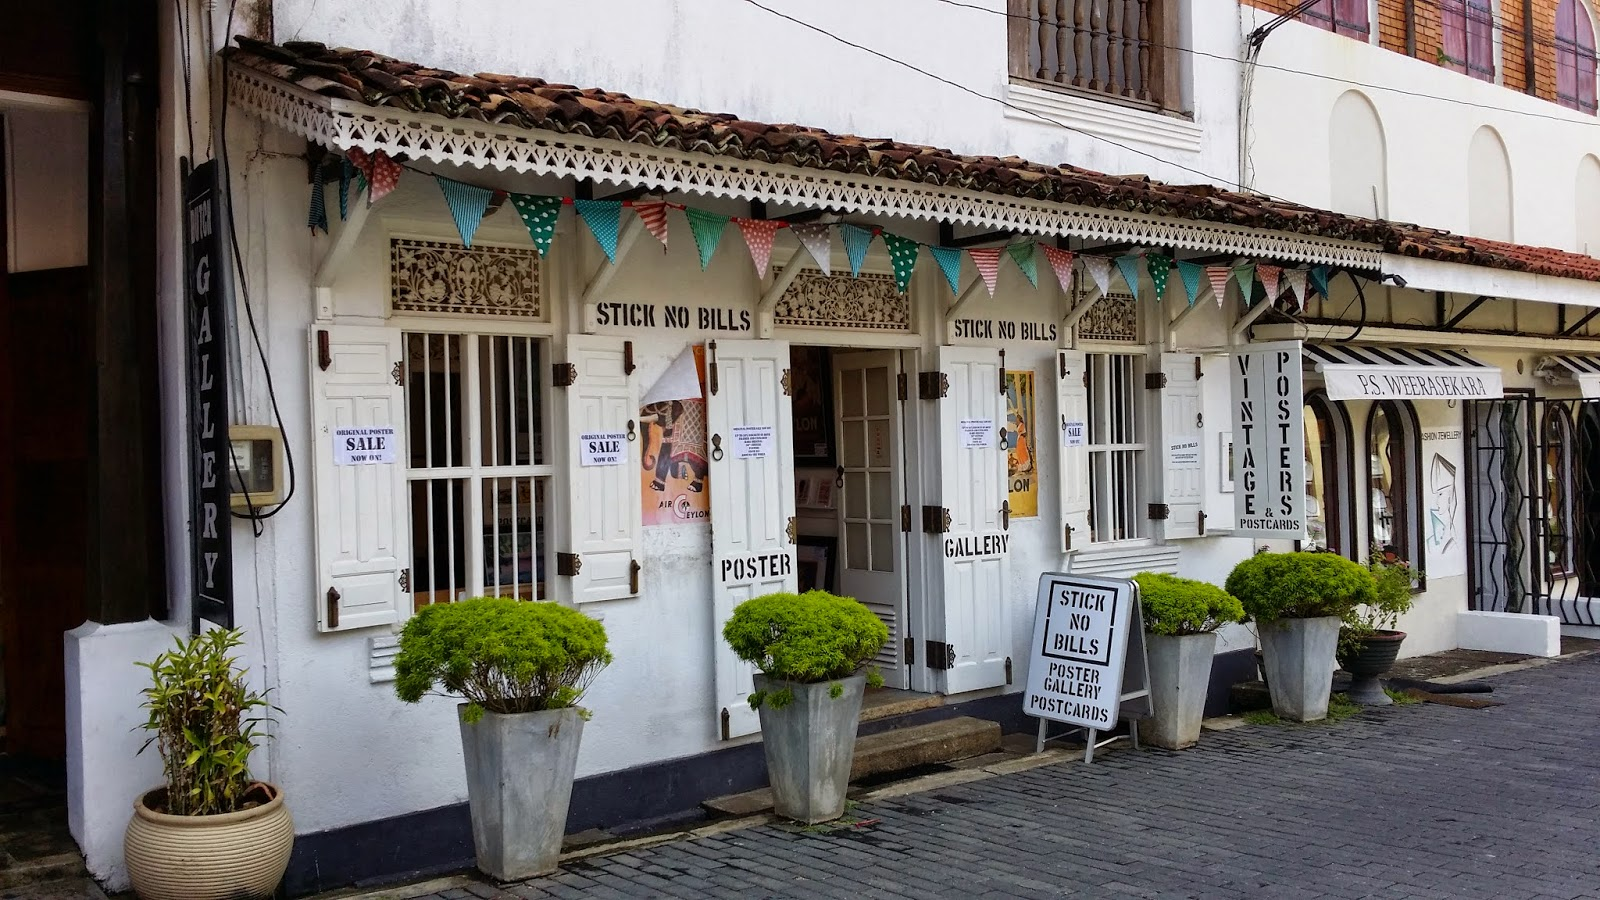 Estética colonial de Galle (Sri Lanka)